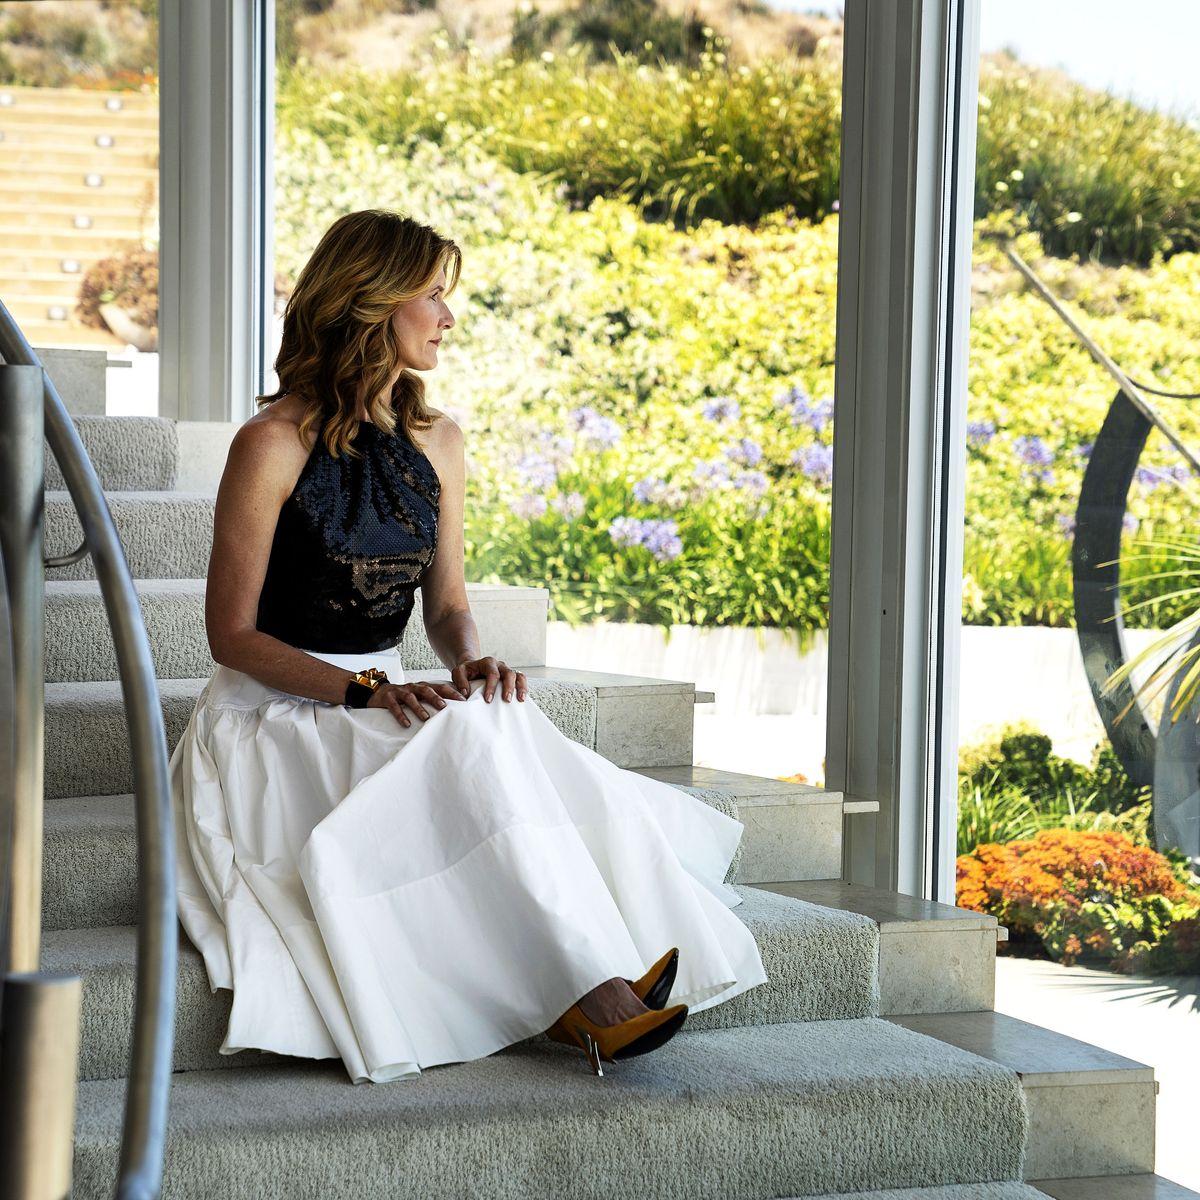 Big Little Lies 'The Bad Mother' Recap, Season 2 Episode 6